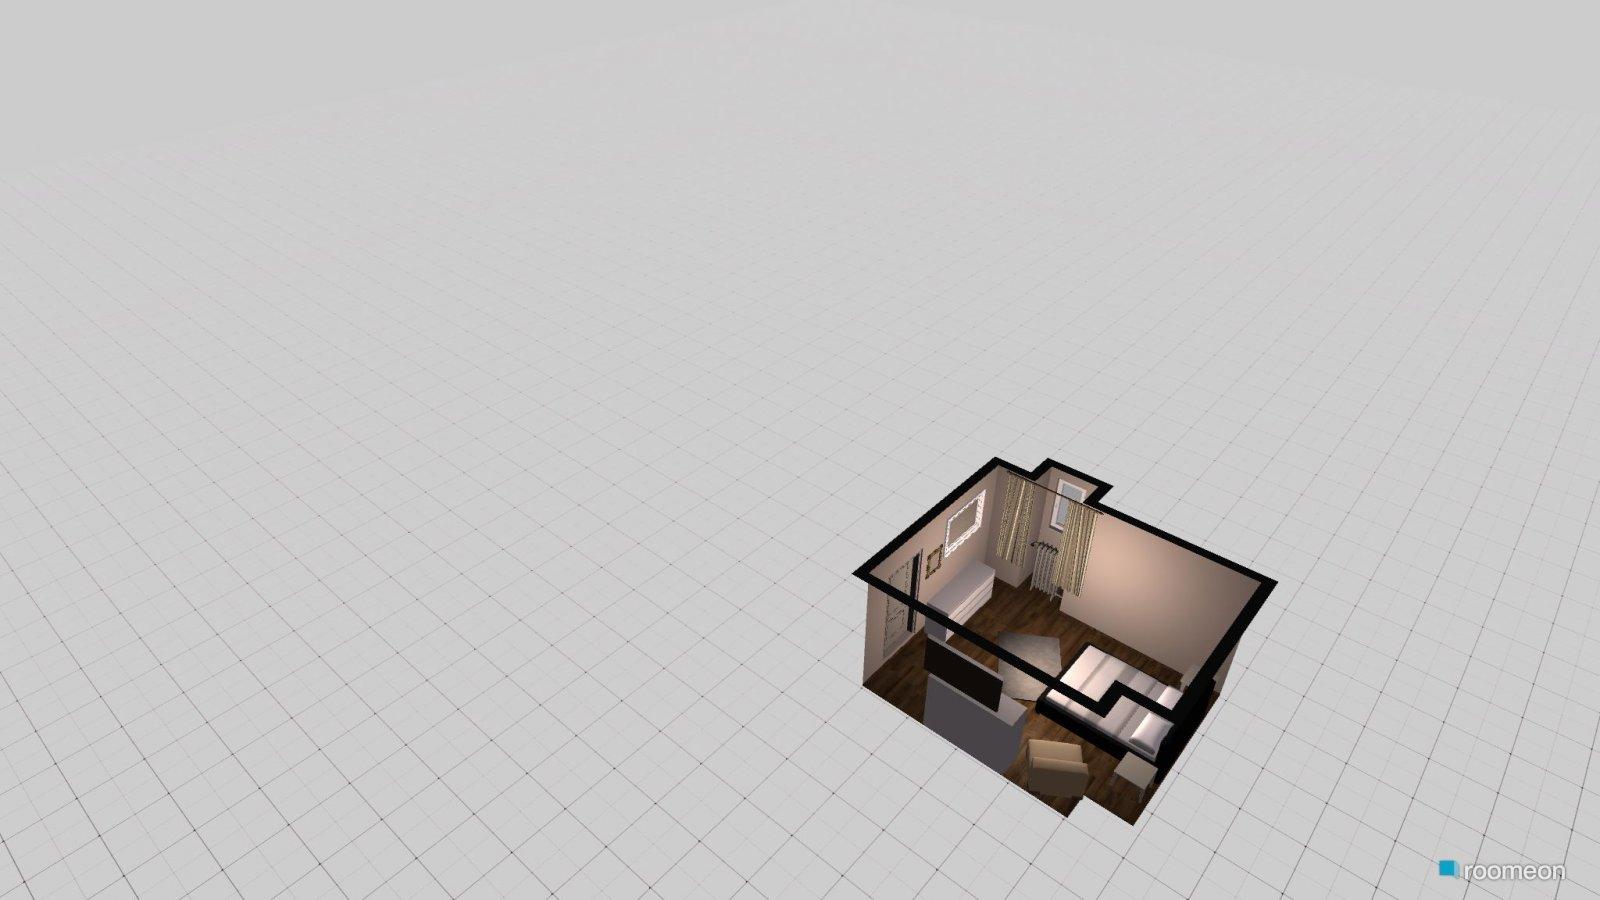 room design xy roomeon community. Black Bedroom Furniture Sets. Home Design Ideas